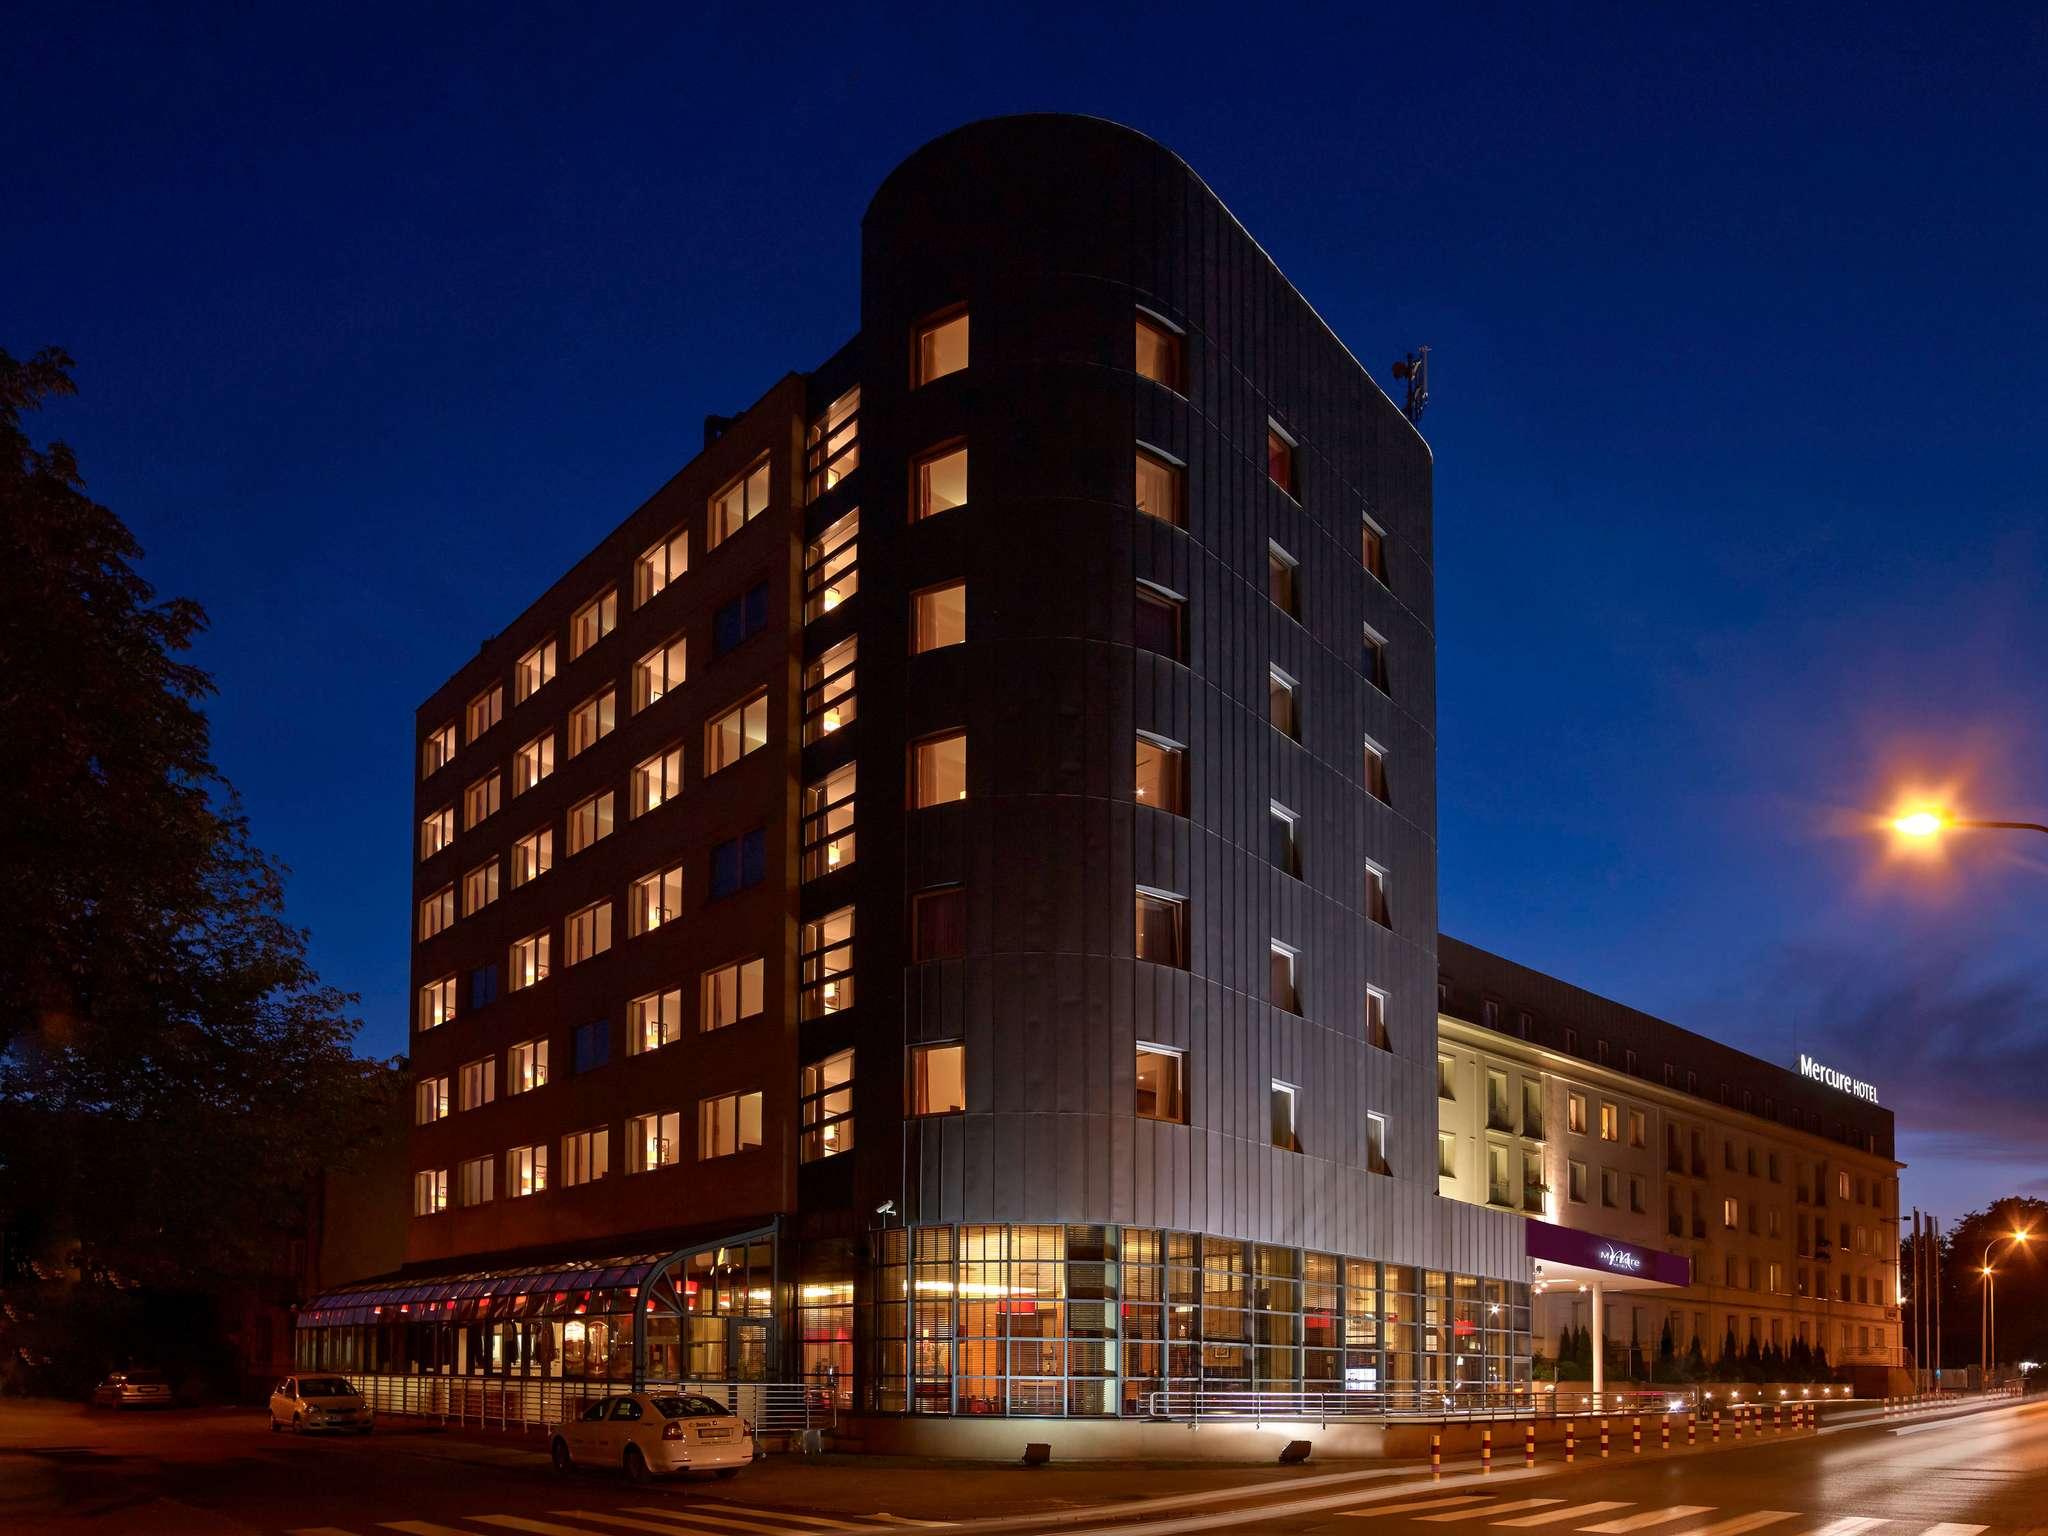 Hotel – Hotel Mercure Warszawa Airport